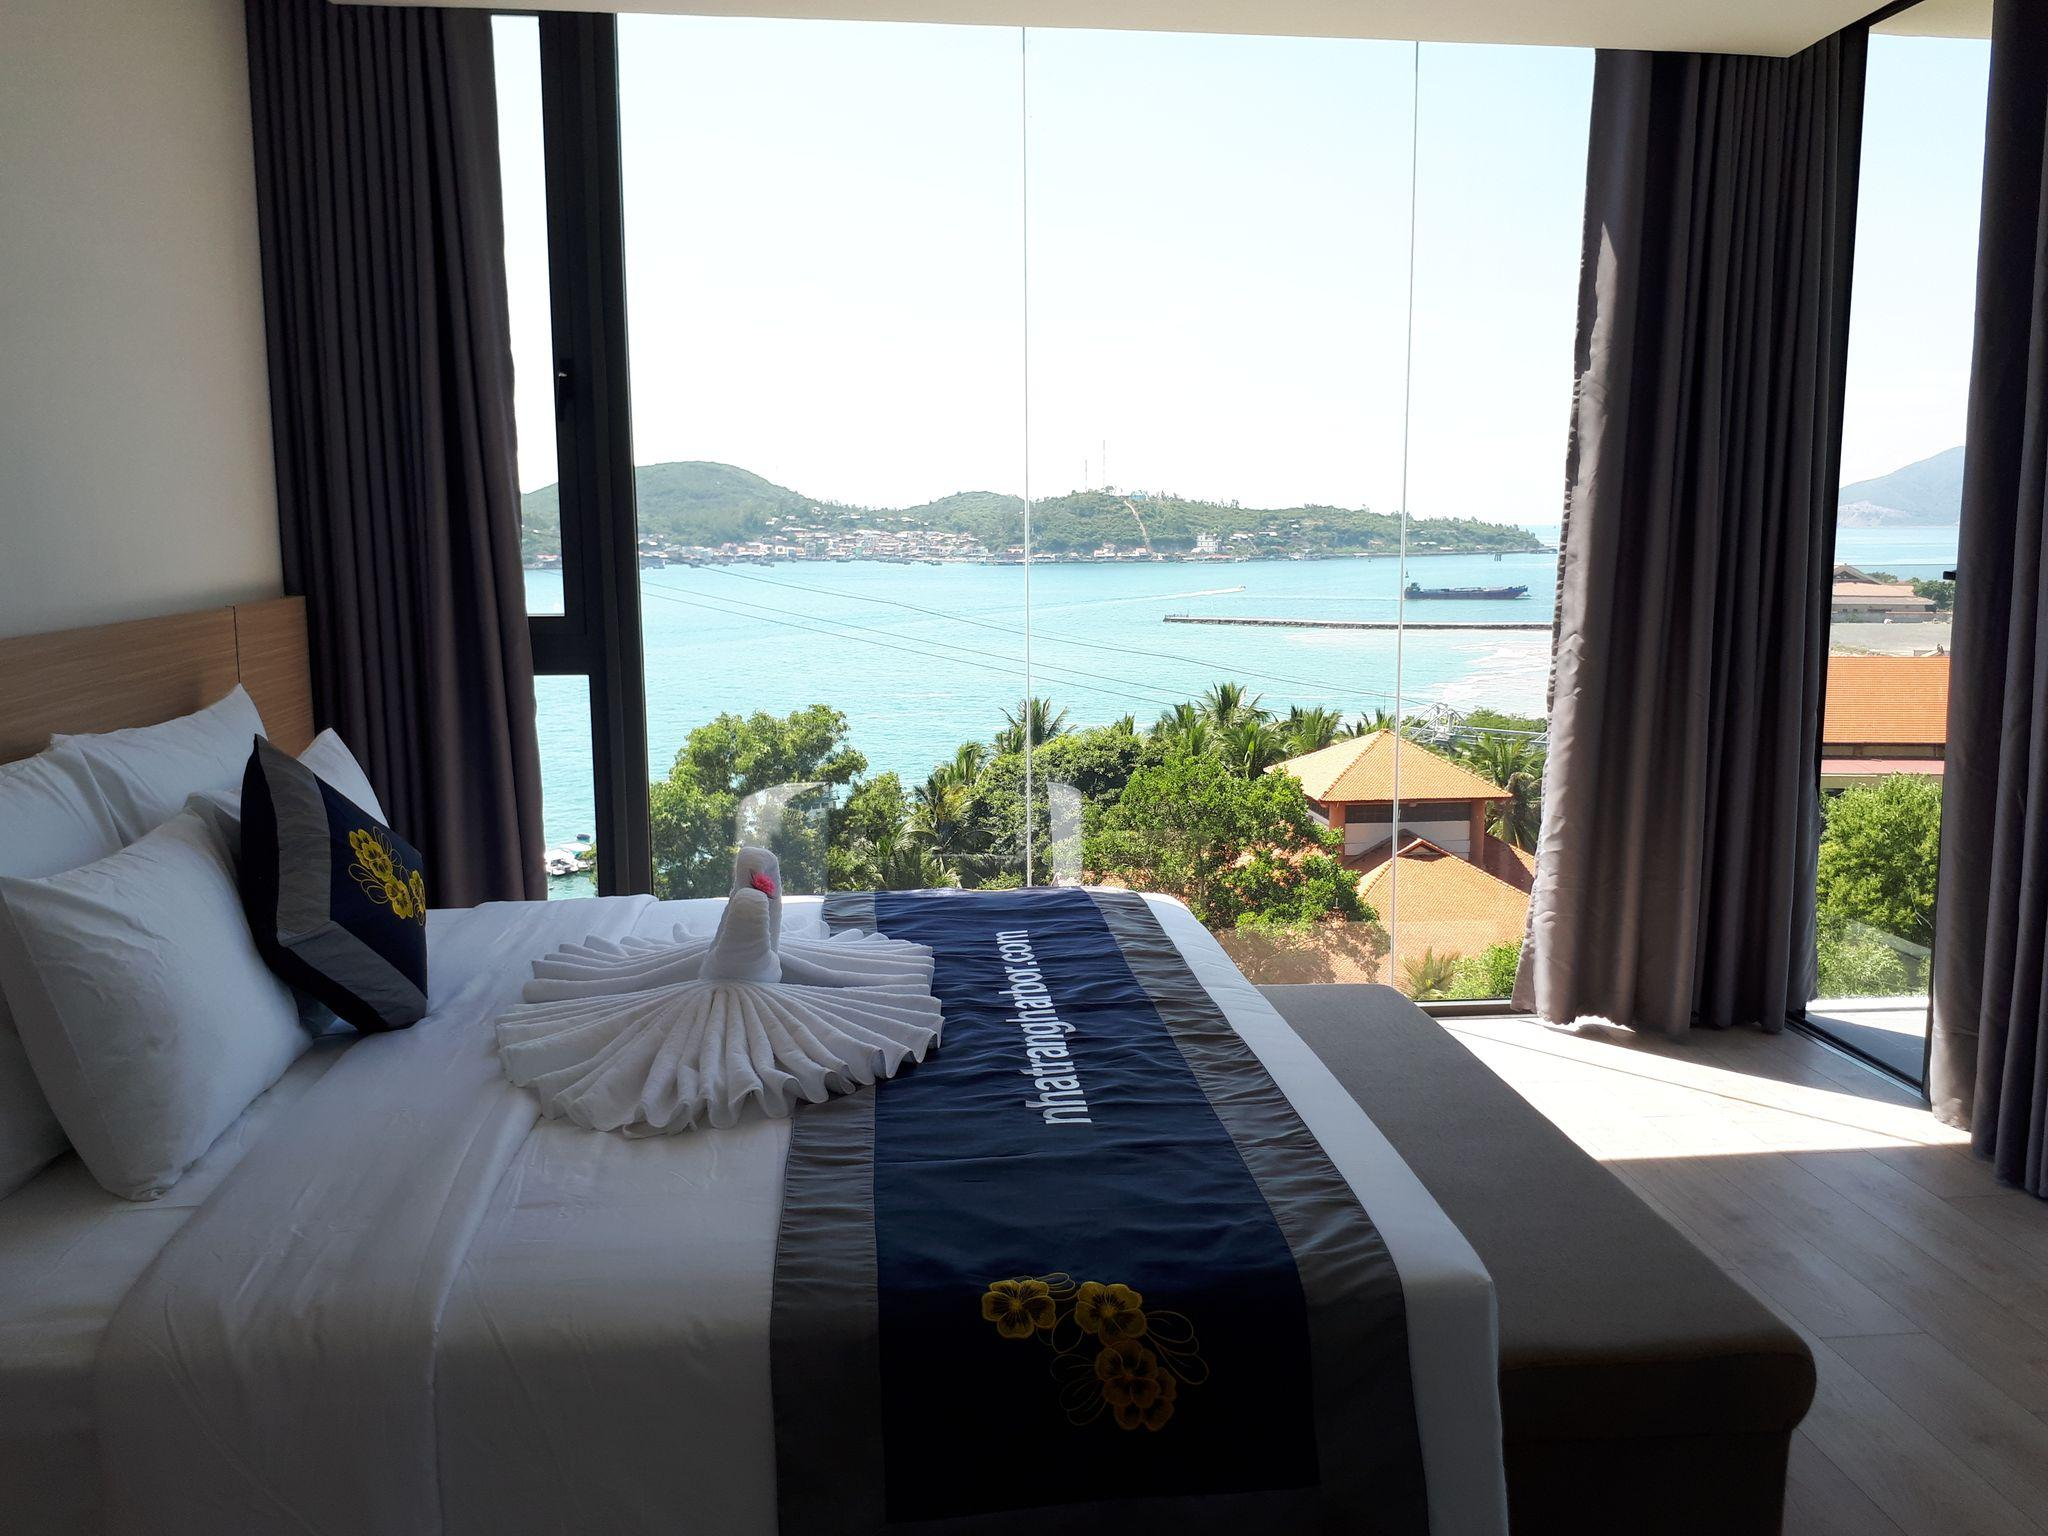 Nha Trang Harbor 2 Bedrooms Studio 1